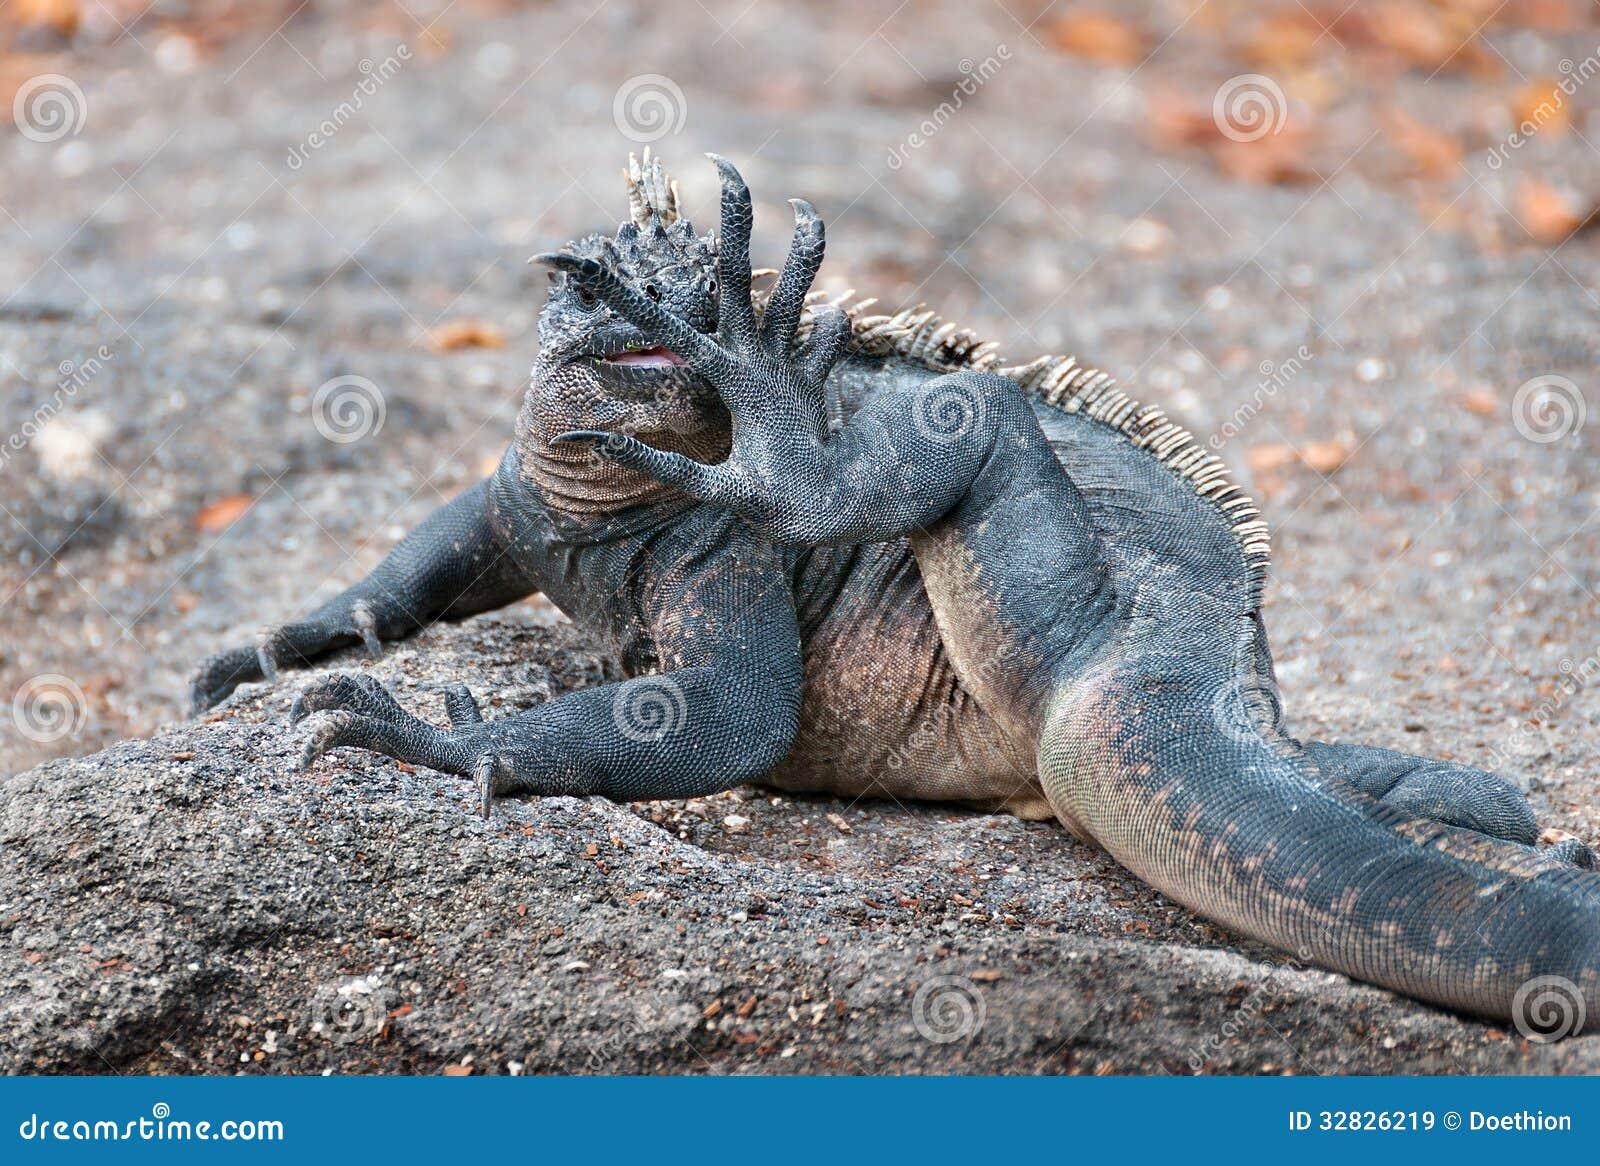 Galapagos Marine Iguana Licking Its Foot Royalty Free